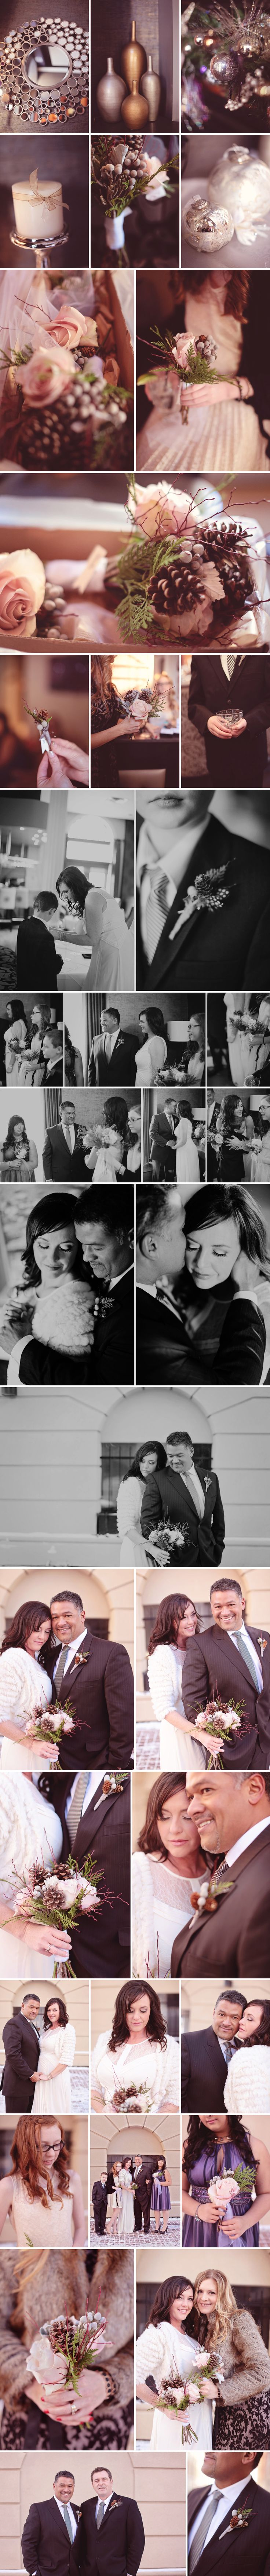 Union bank inn edmonton wedding photography